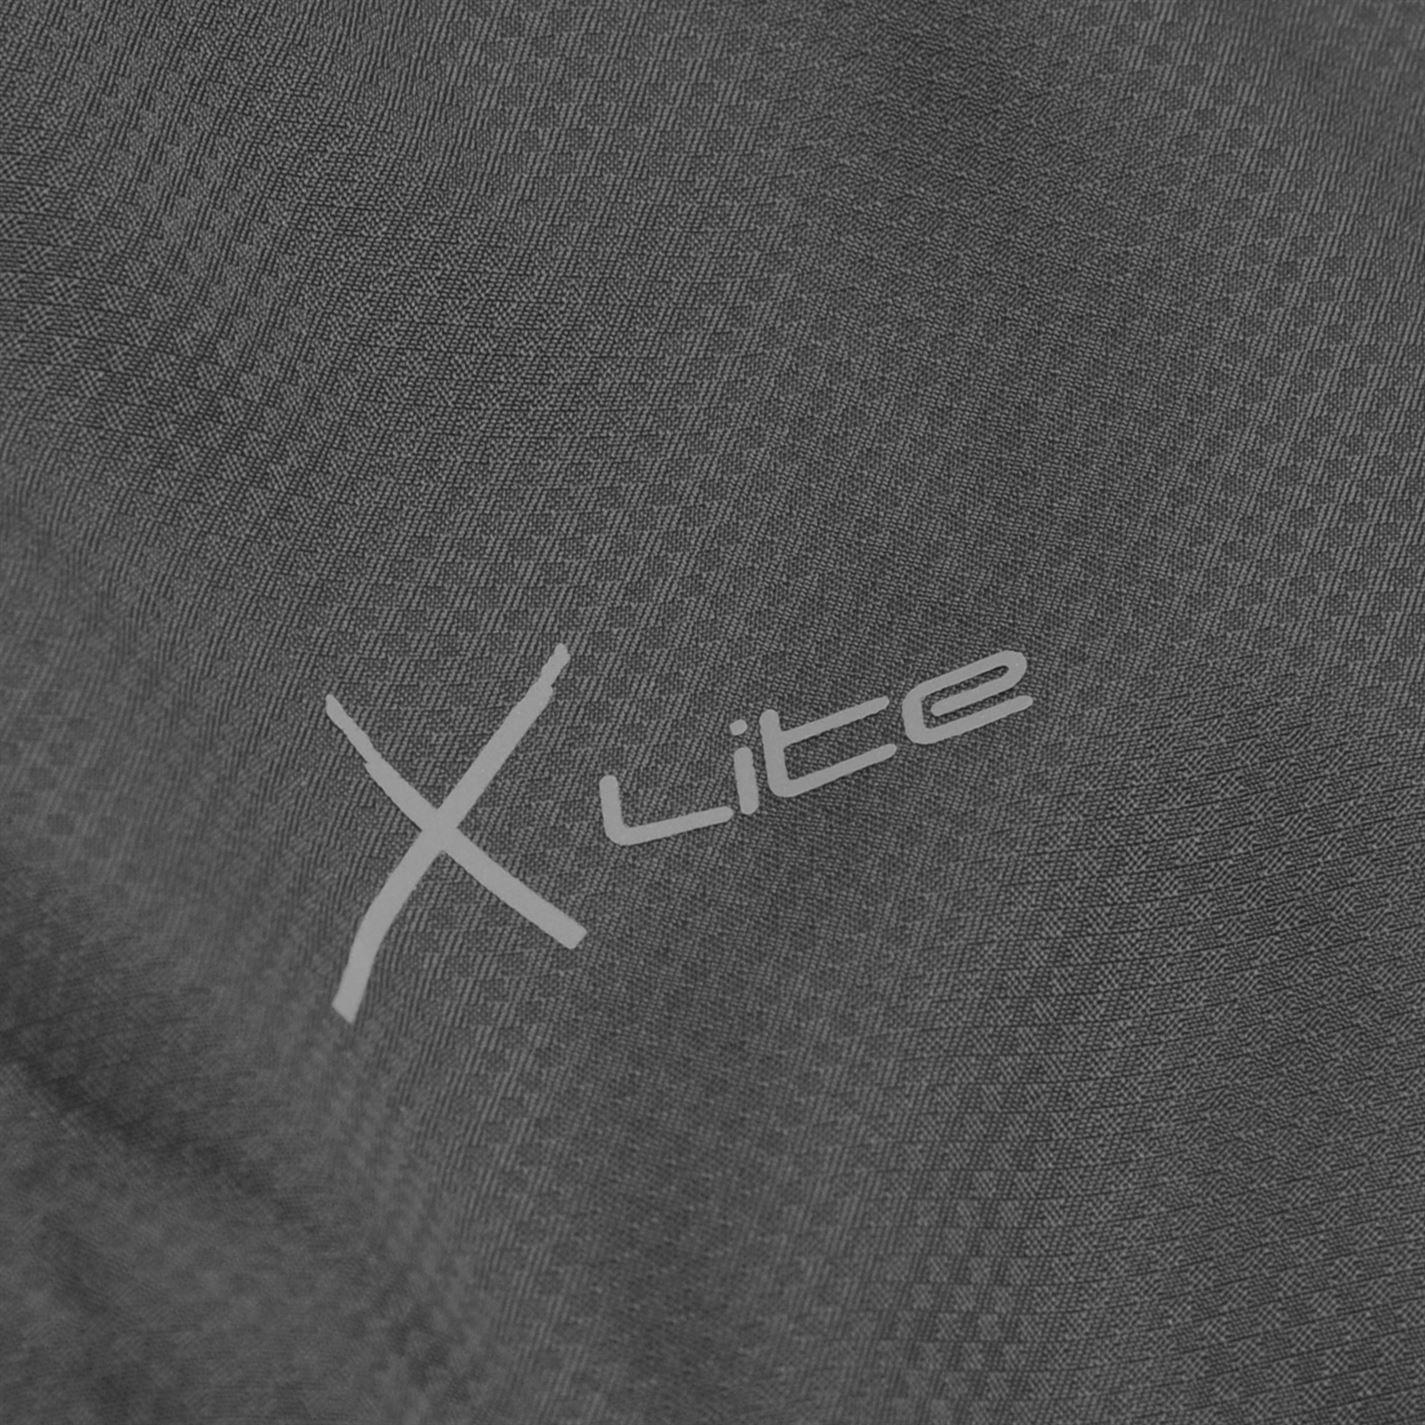 Karrimor-XLite-2in1-Shorts-Performance-Mens thumbnail 22